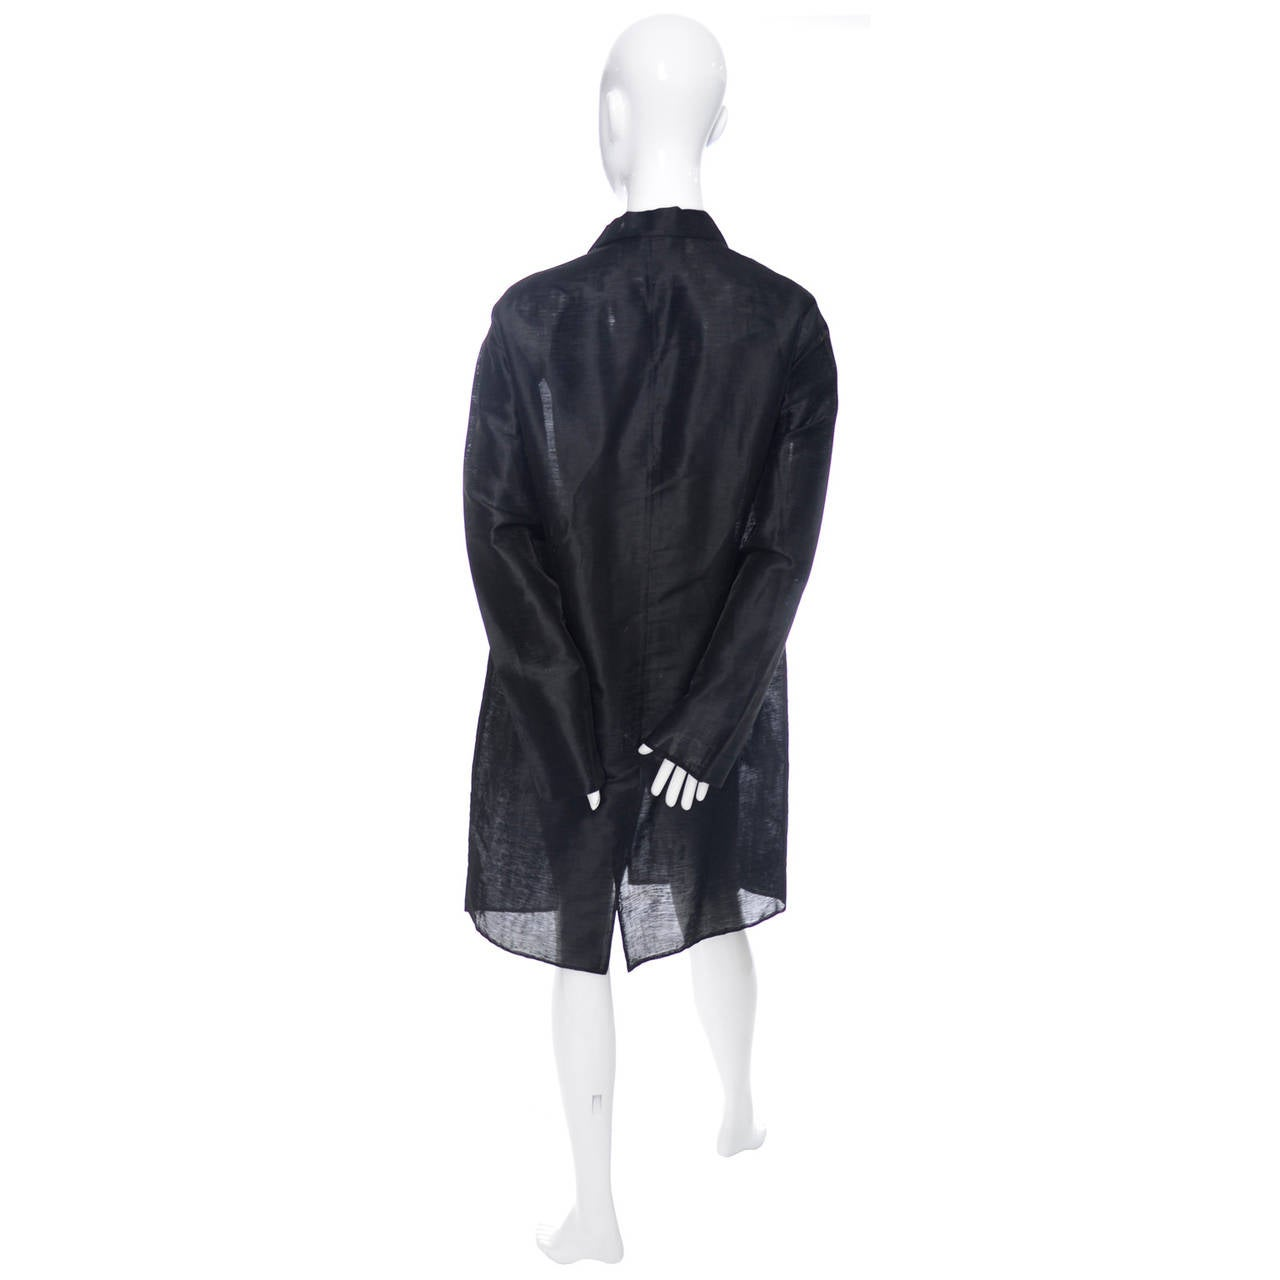 Donna Karan New York Black Label Linen Organza Evening Coat Semi Sheer 2